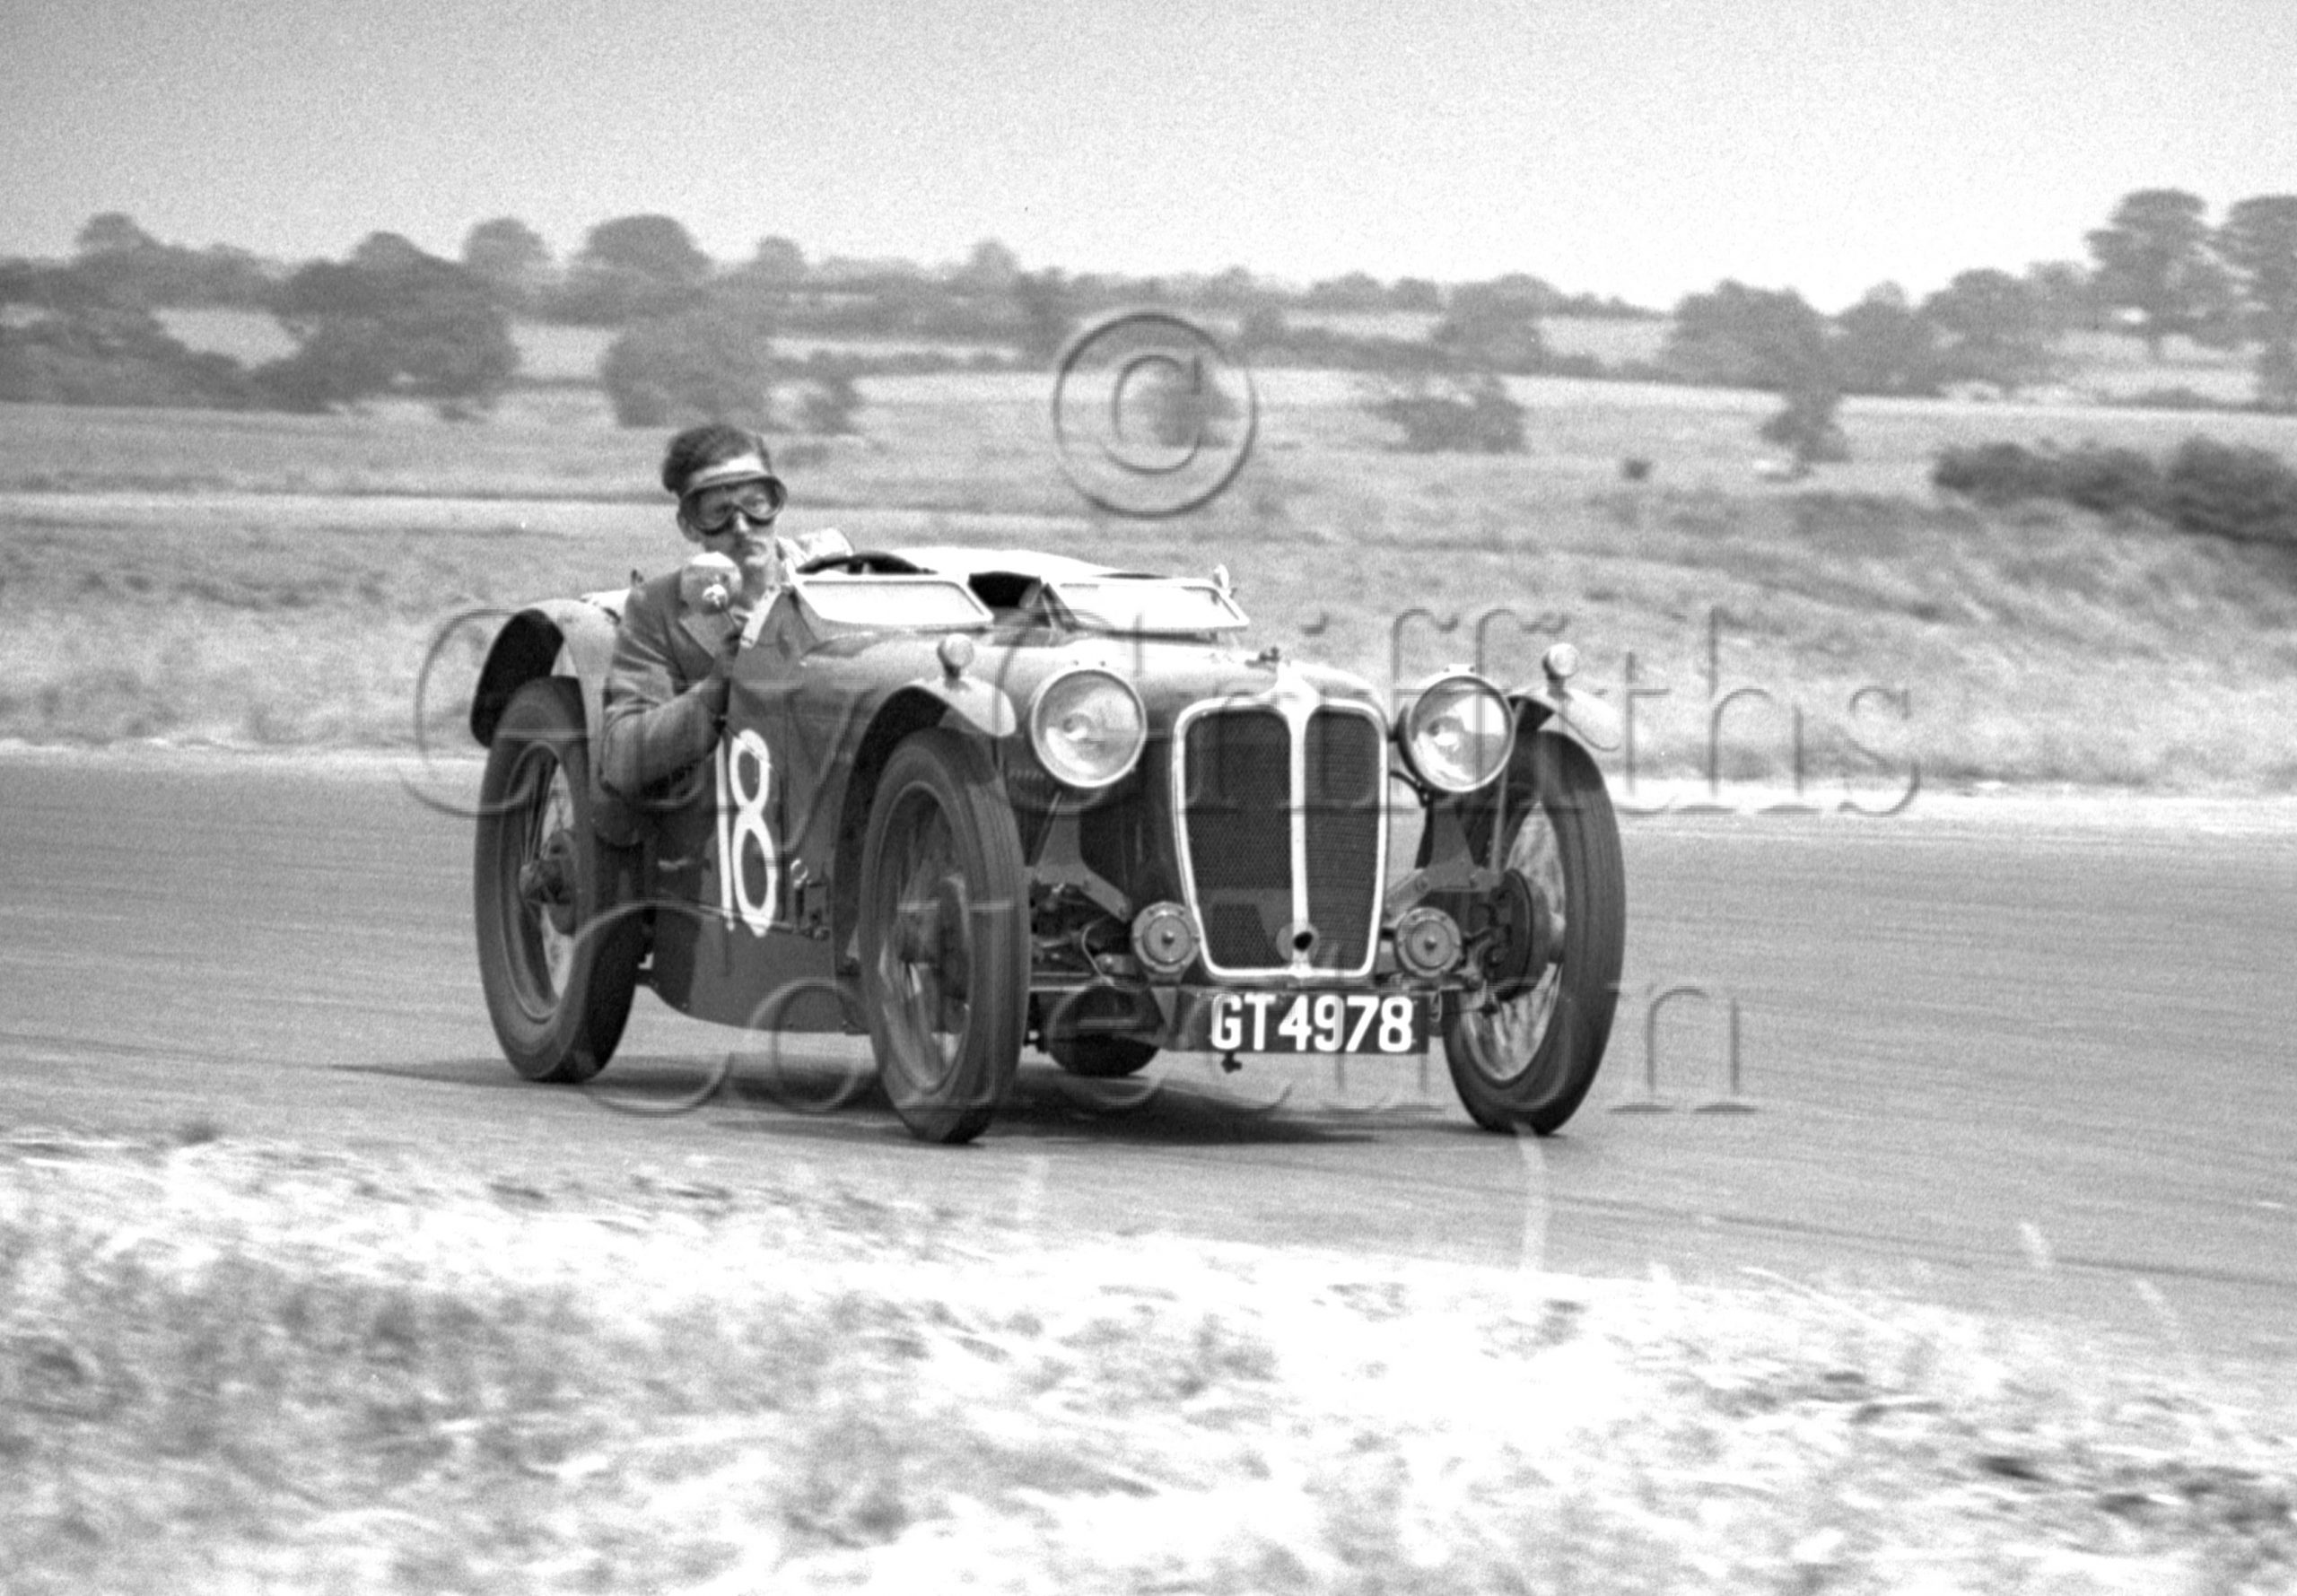 17-995–N-F-Watson–Austin–GT-4978–Silverstone–02-07-1949.jpg - Guy Griffiths Collection